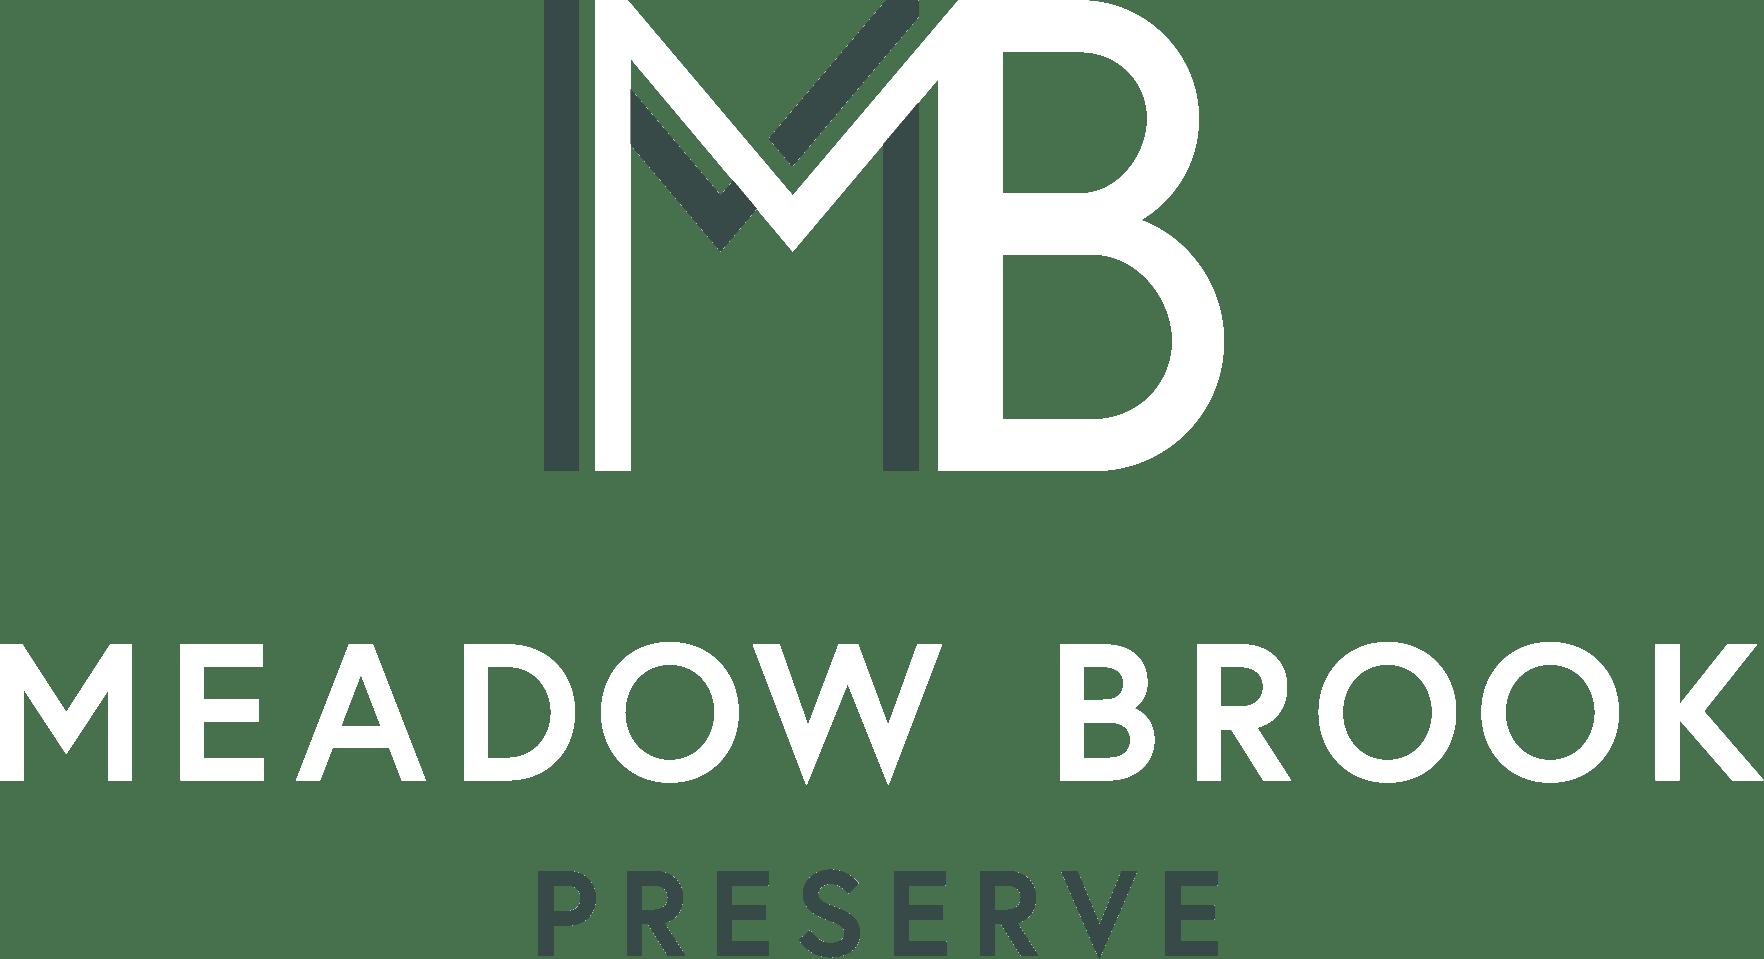 Meadow Brook Preserve